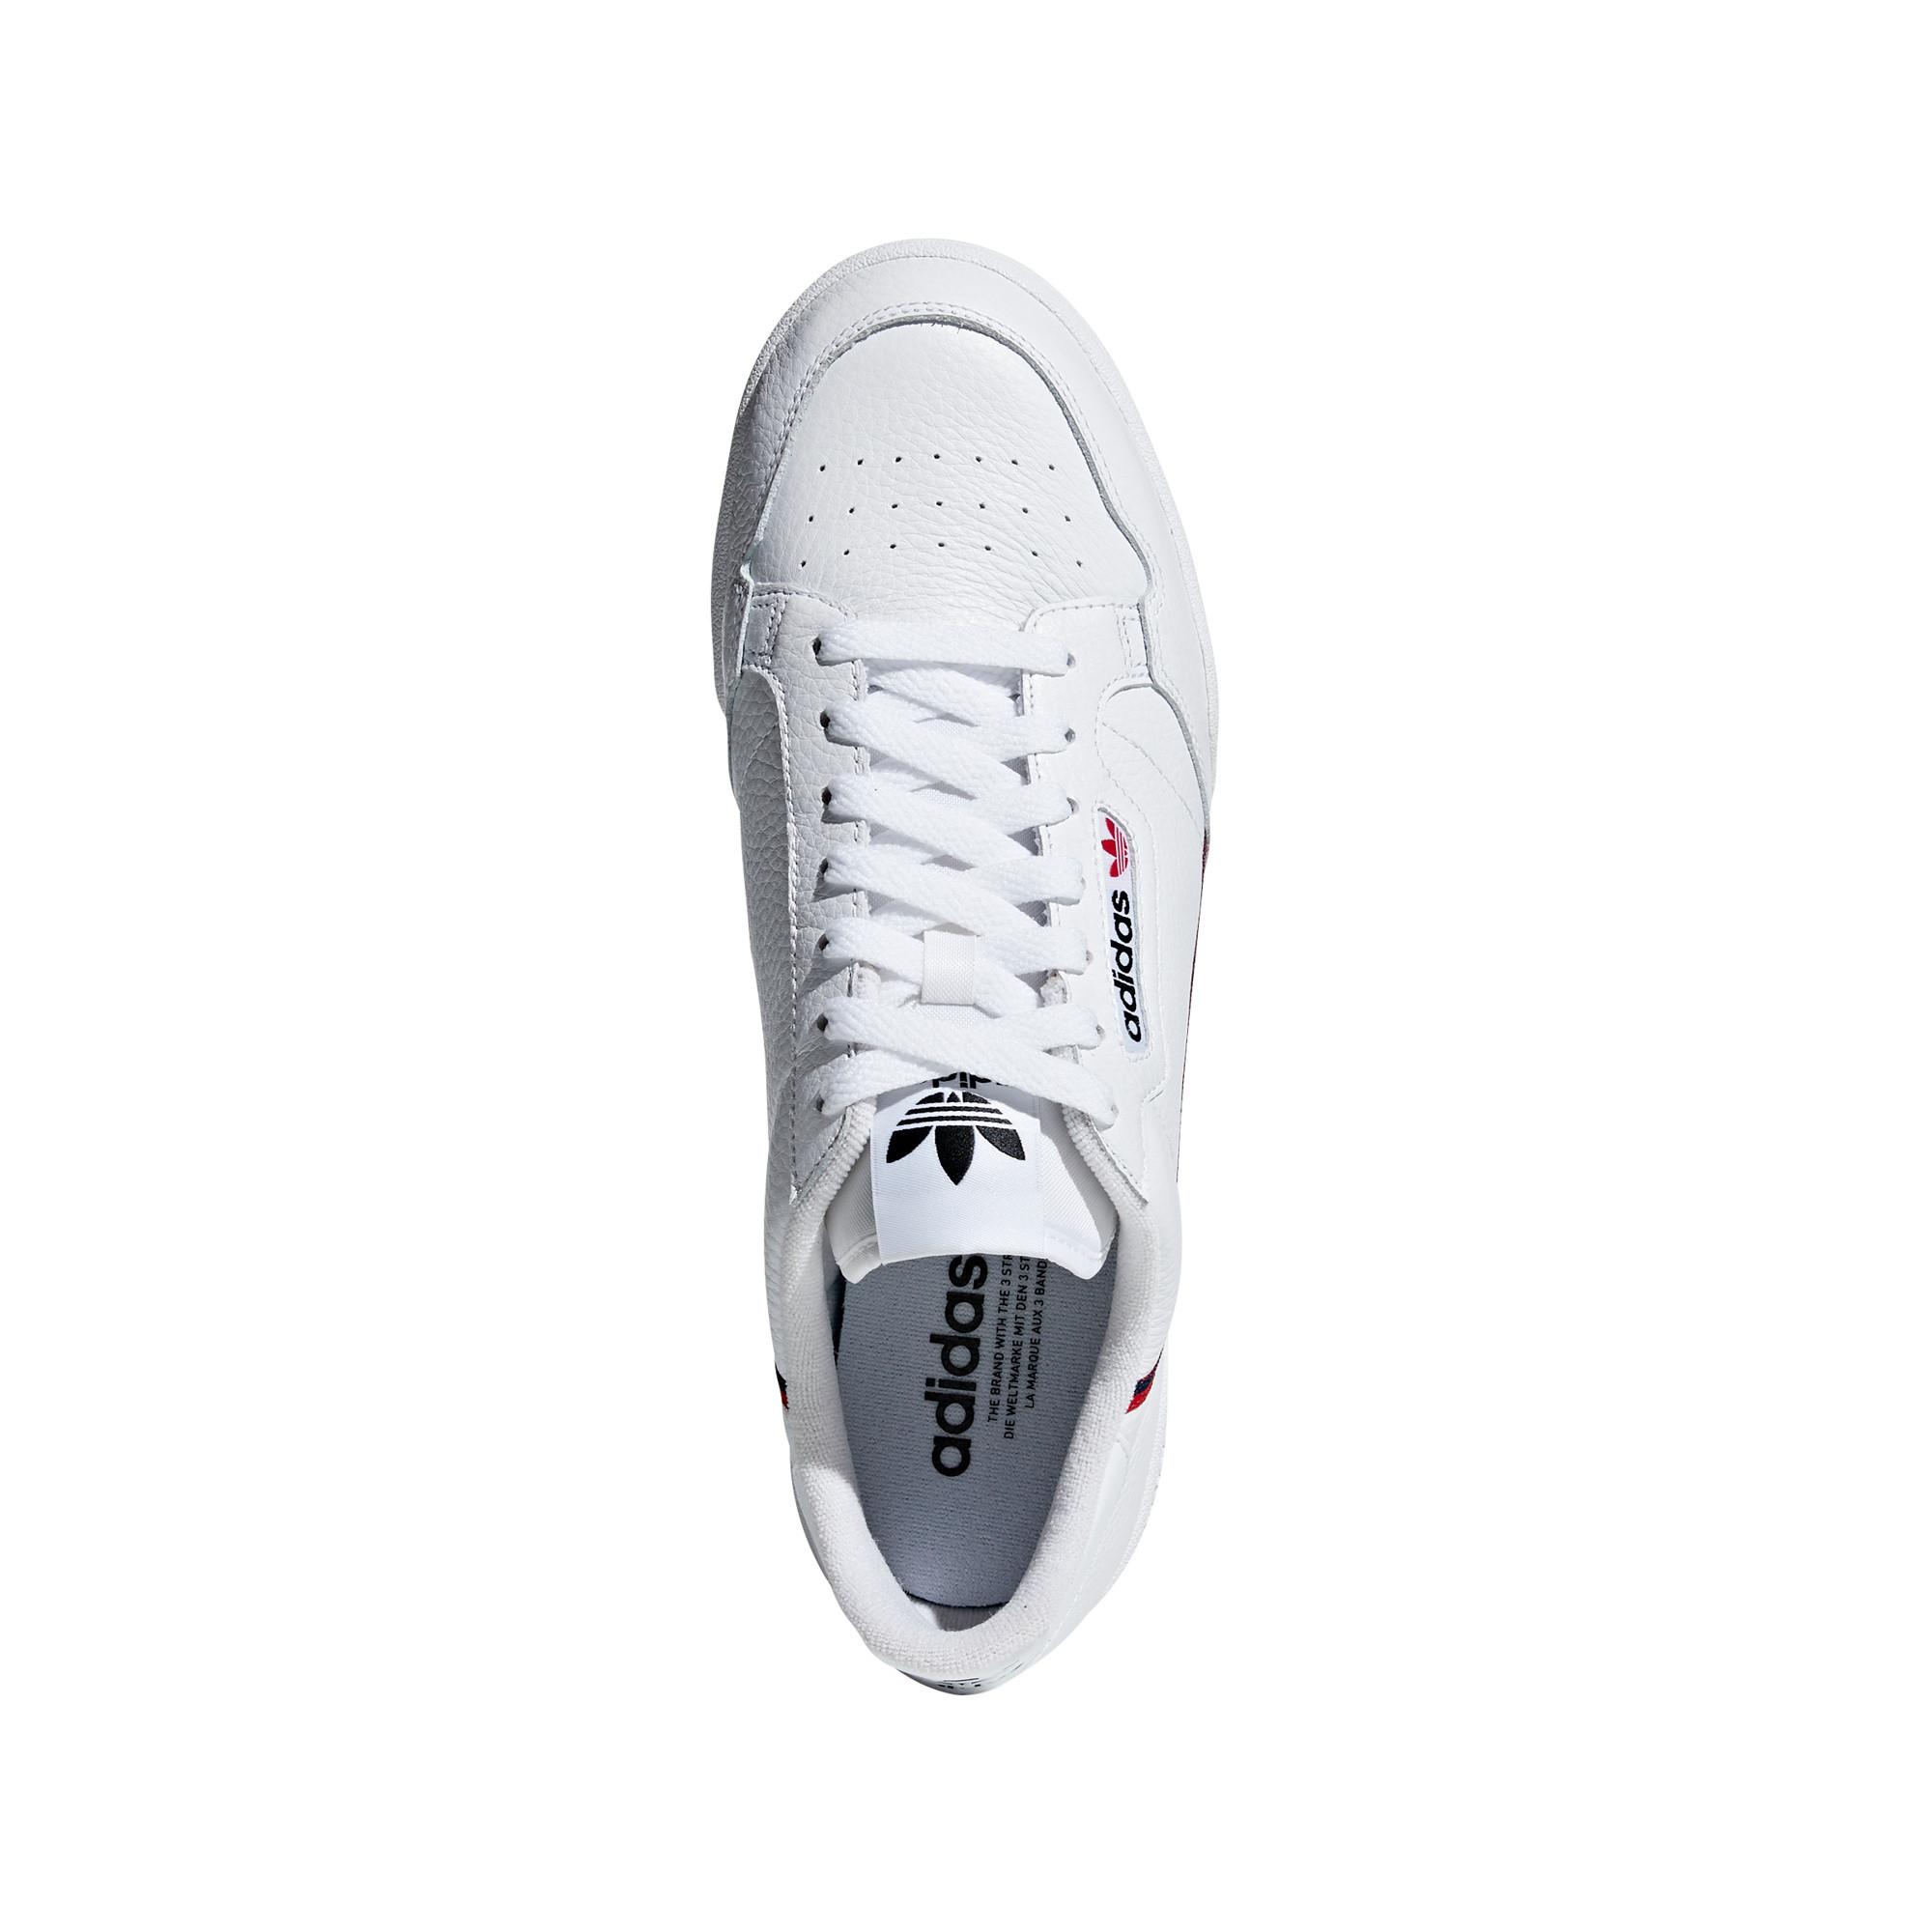 Scarpe uomo Continental 80, Bianco, large image number 7